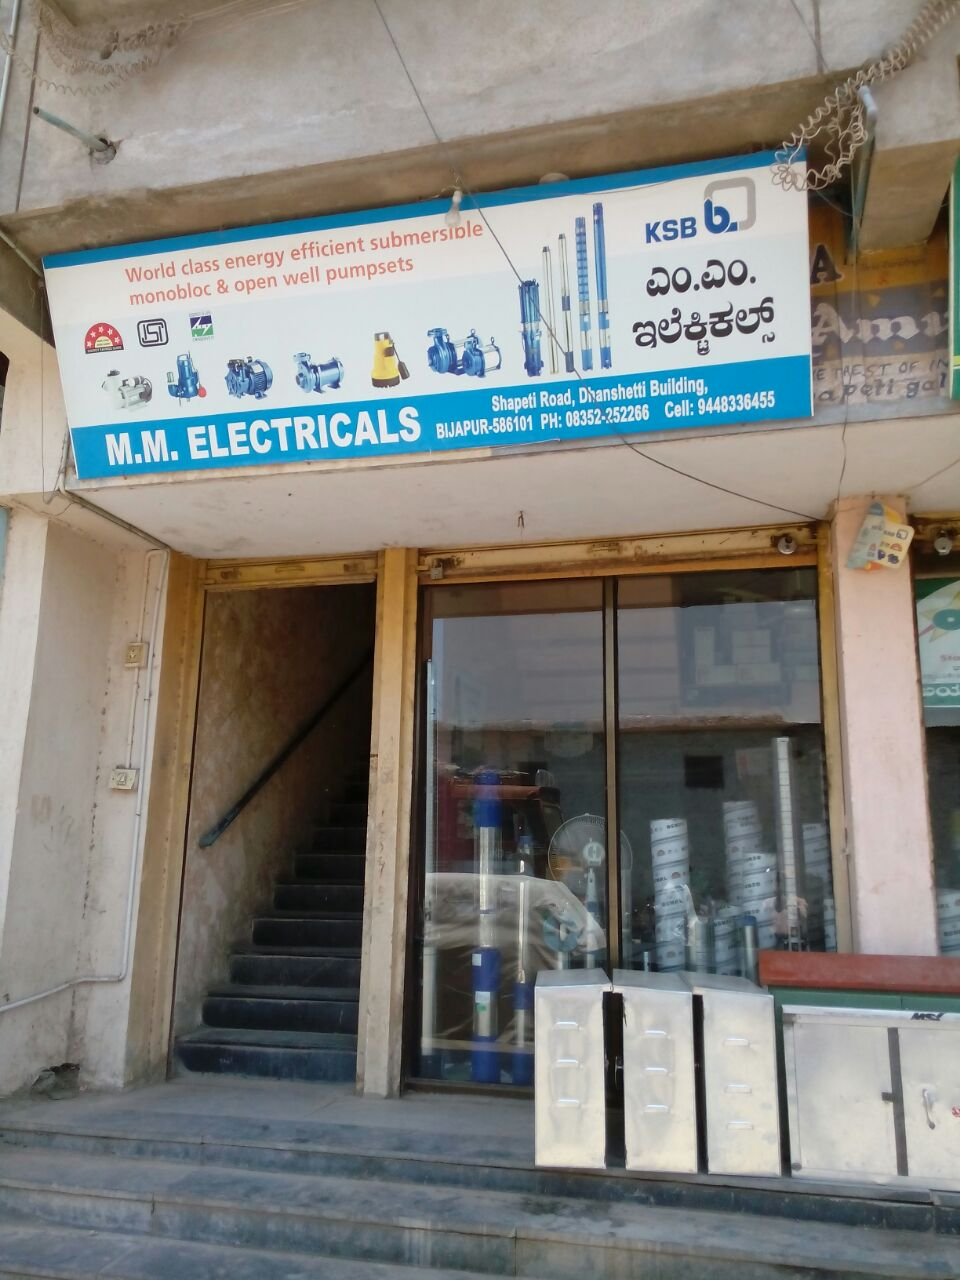 Pumps & Pumpset Distributors in Bijapur | The Telit Yelow Pages